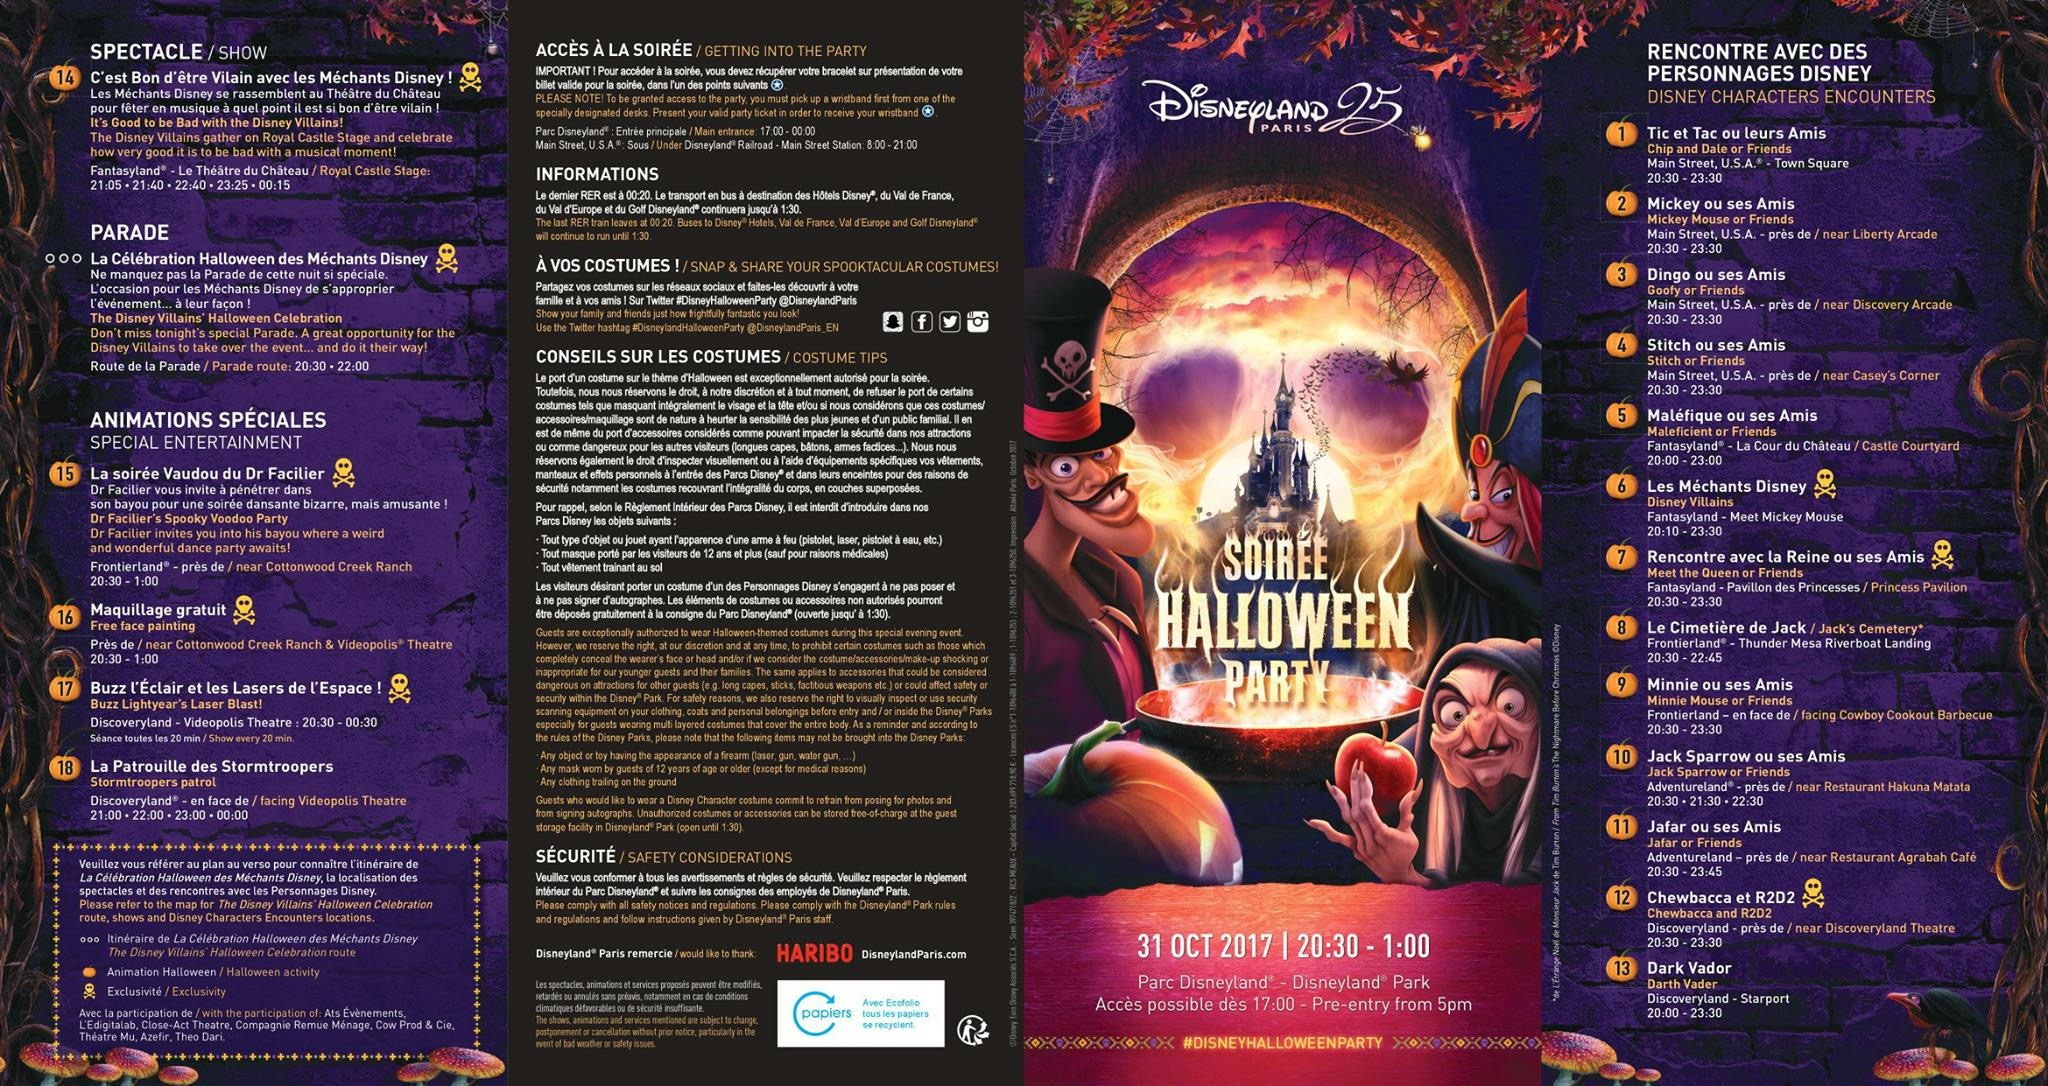 La Soirée Halloween Disney (31 octobre 2017)  - Page 6 37777328641_c866060dac_o_d